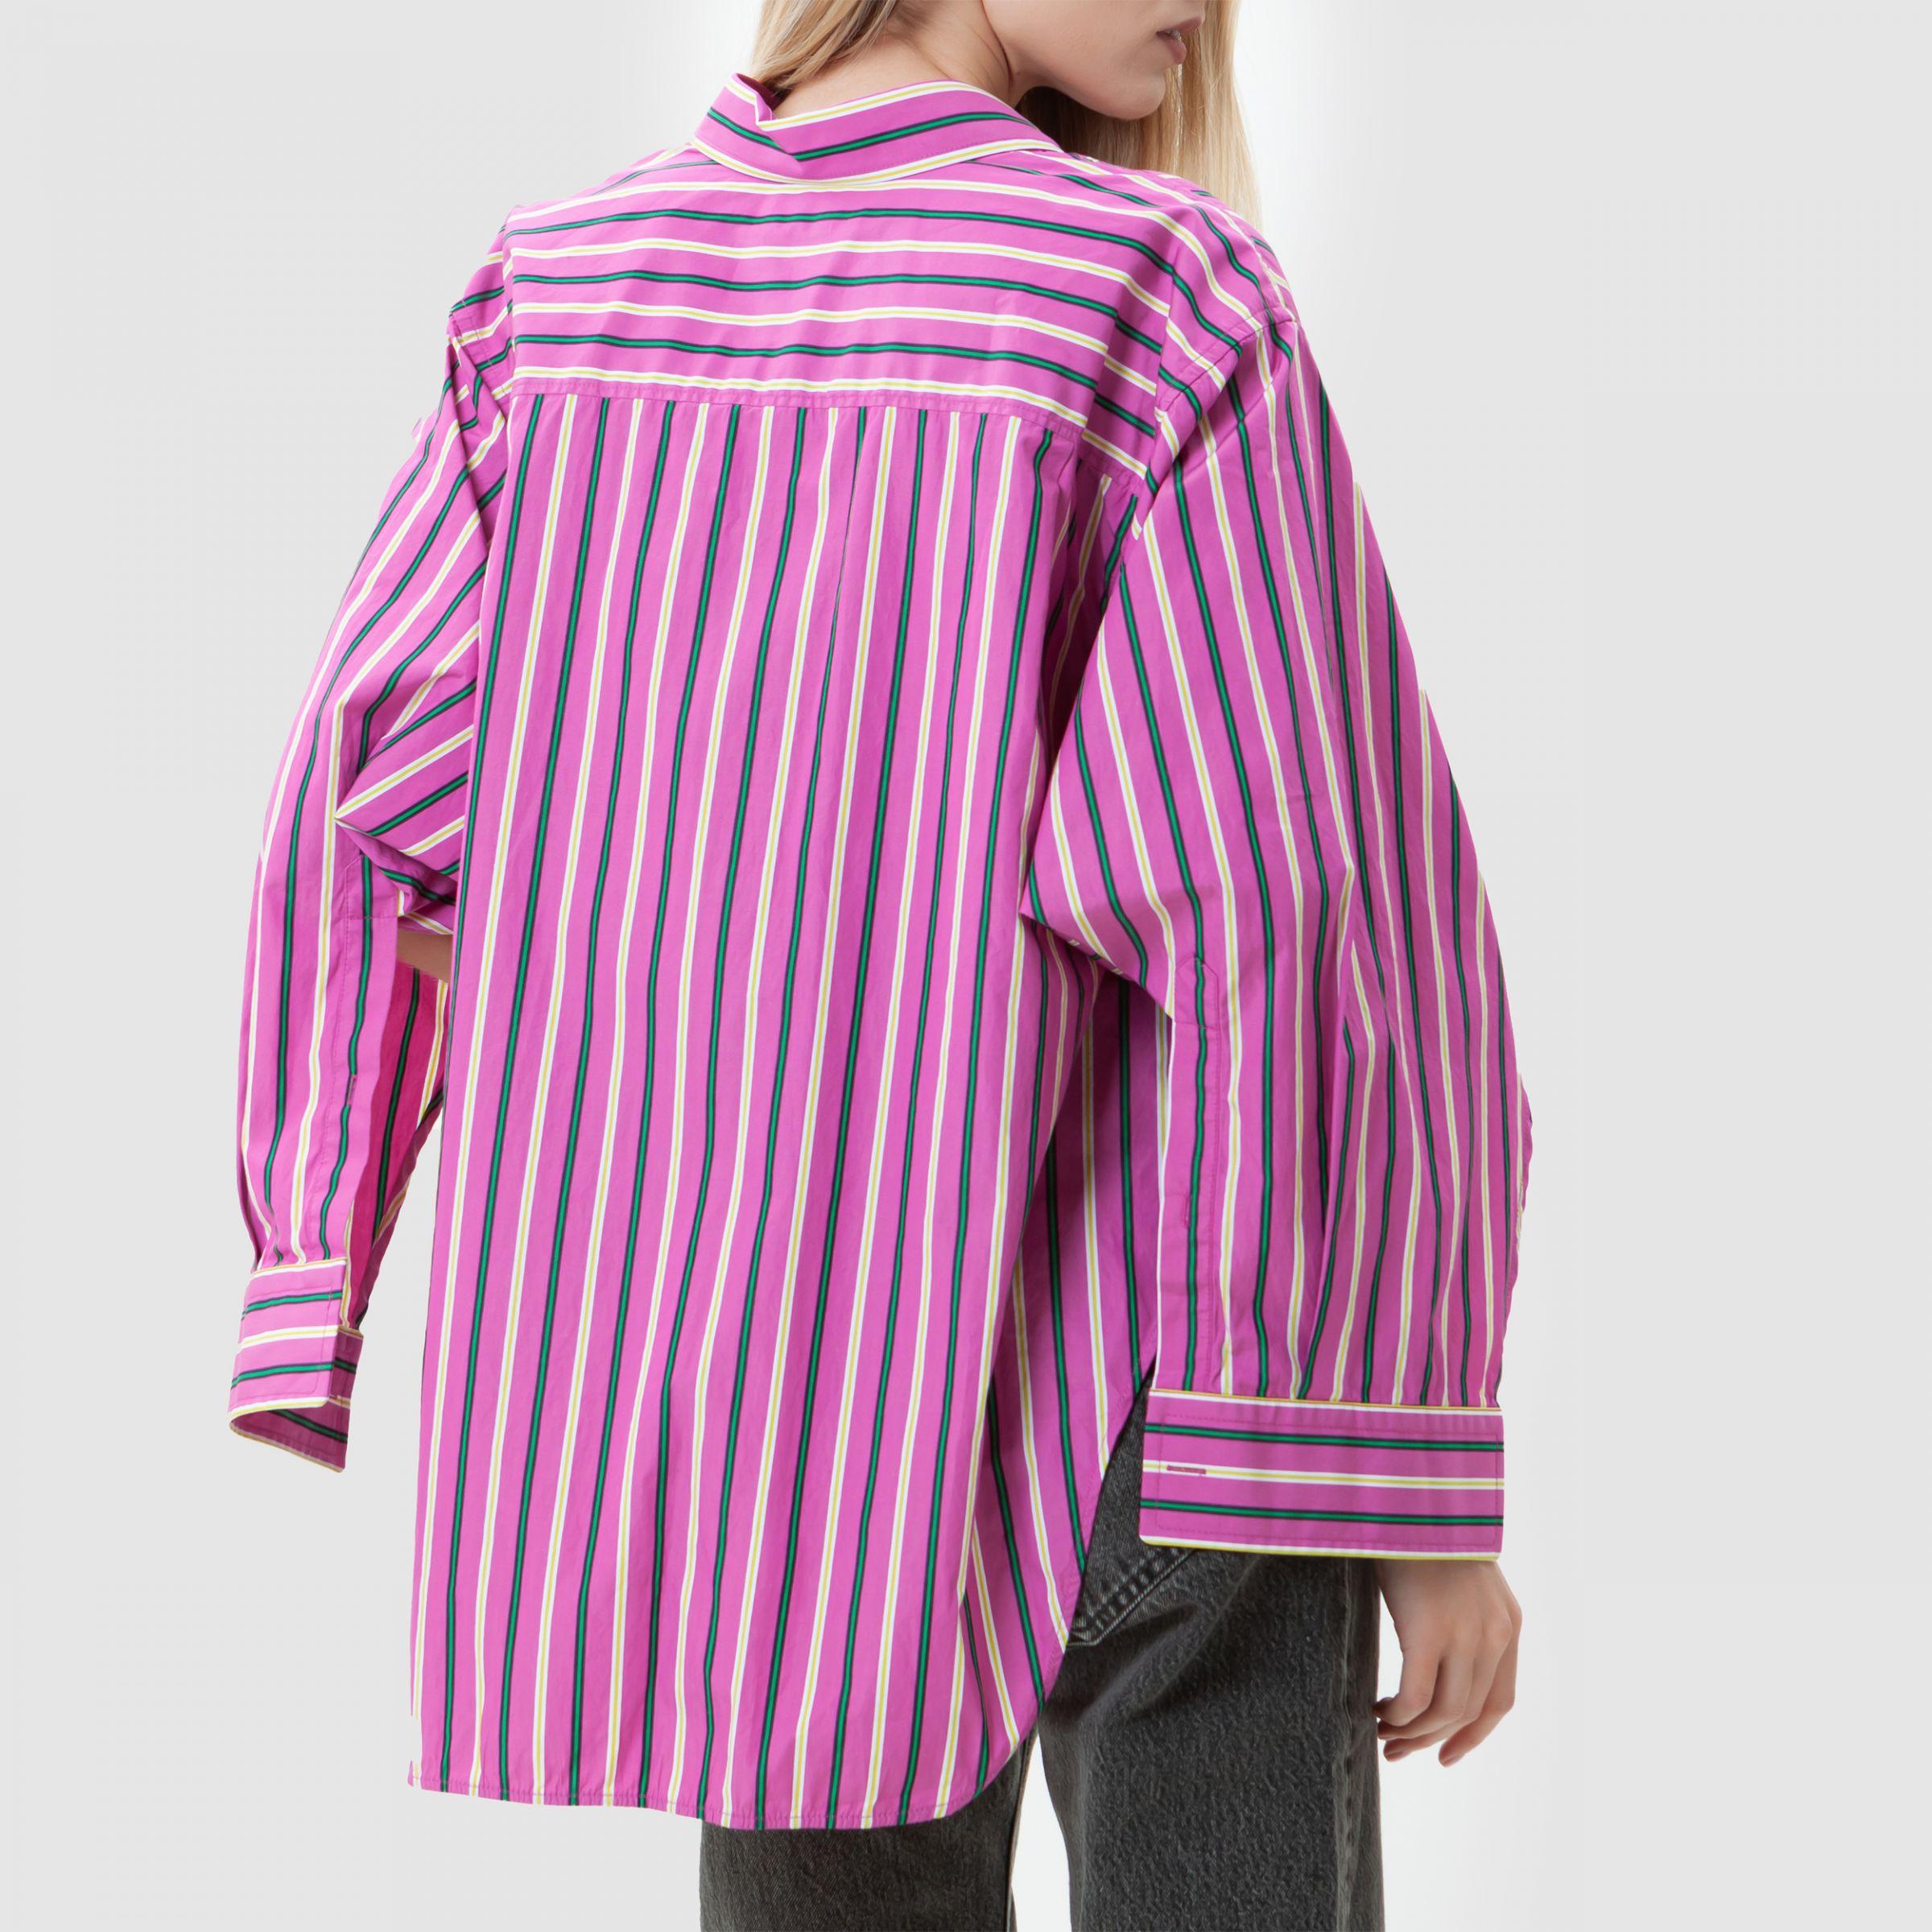 Рубашка с длинными рукавами Balenciaga SWING TWISTED розовая